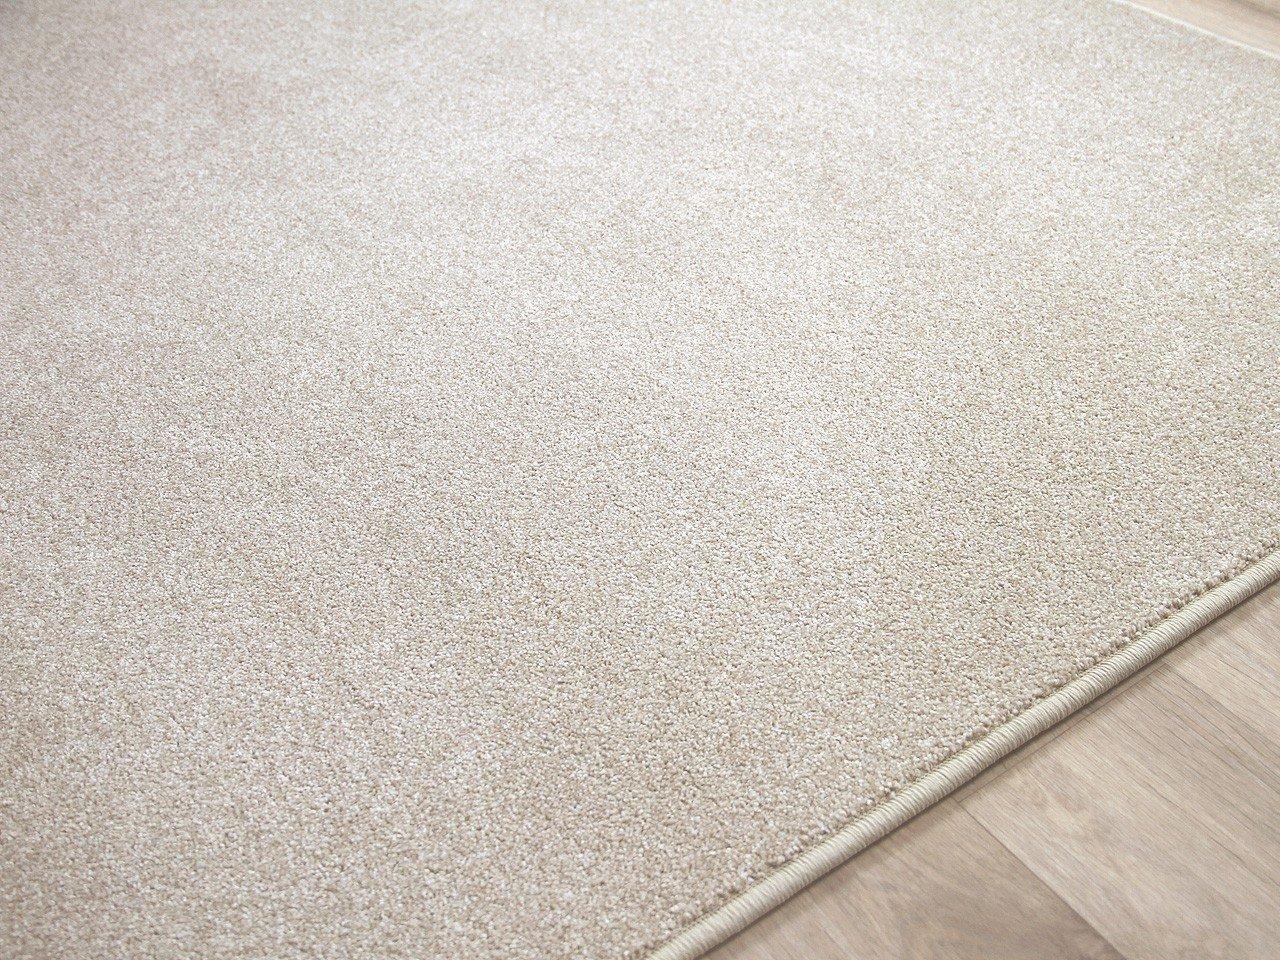 Hochflor Velours Teppich Belini Melange Creme Natur in 24 24 24 Größen B00SUMGD8I Teppiche c1d94d